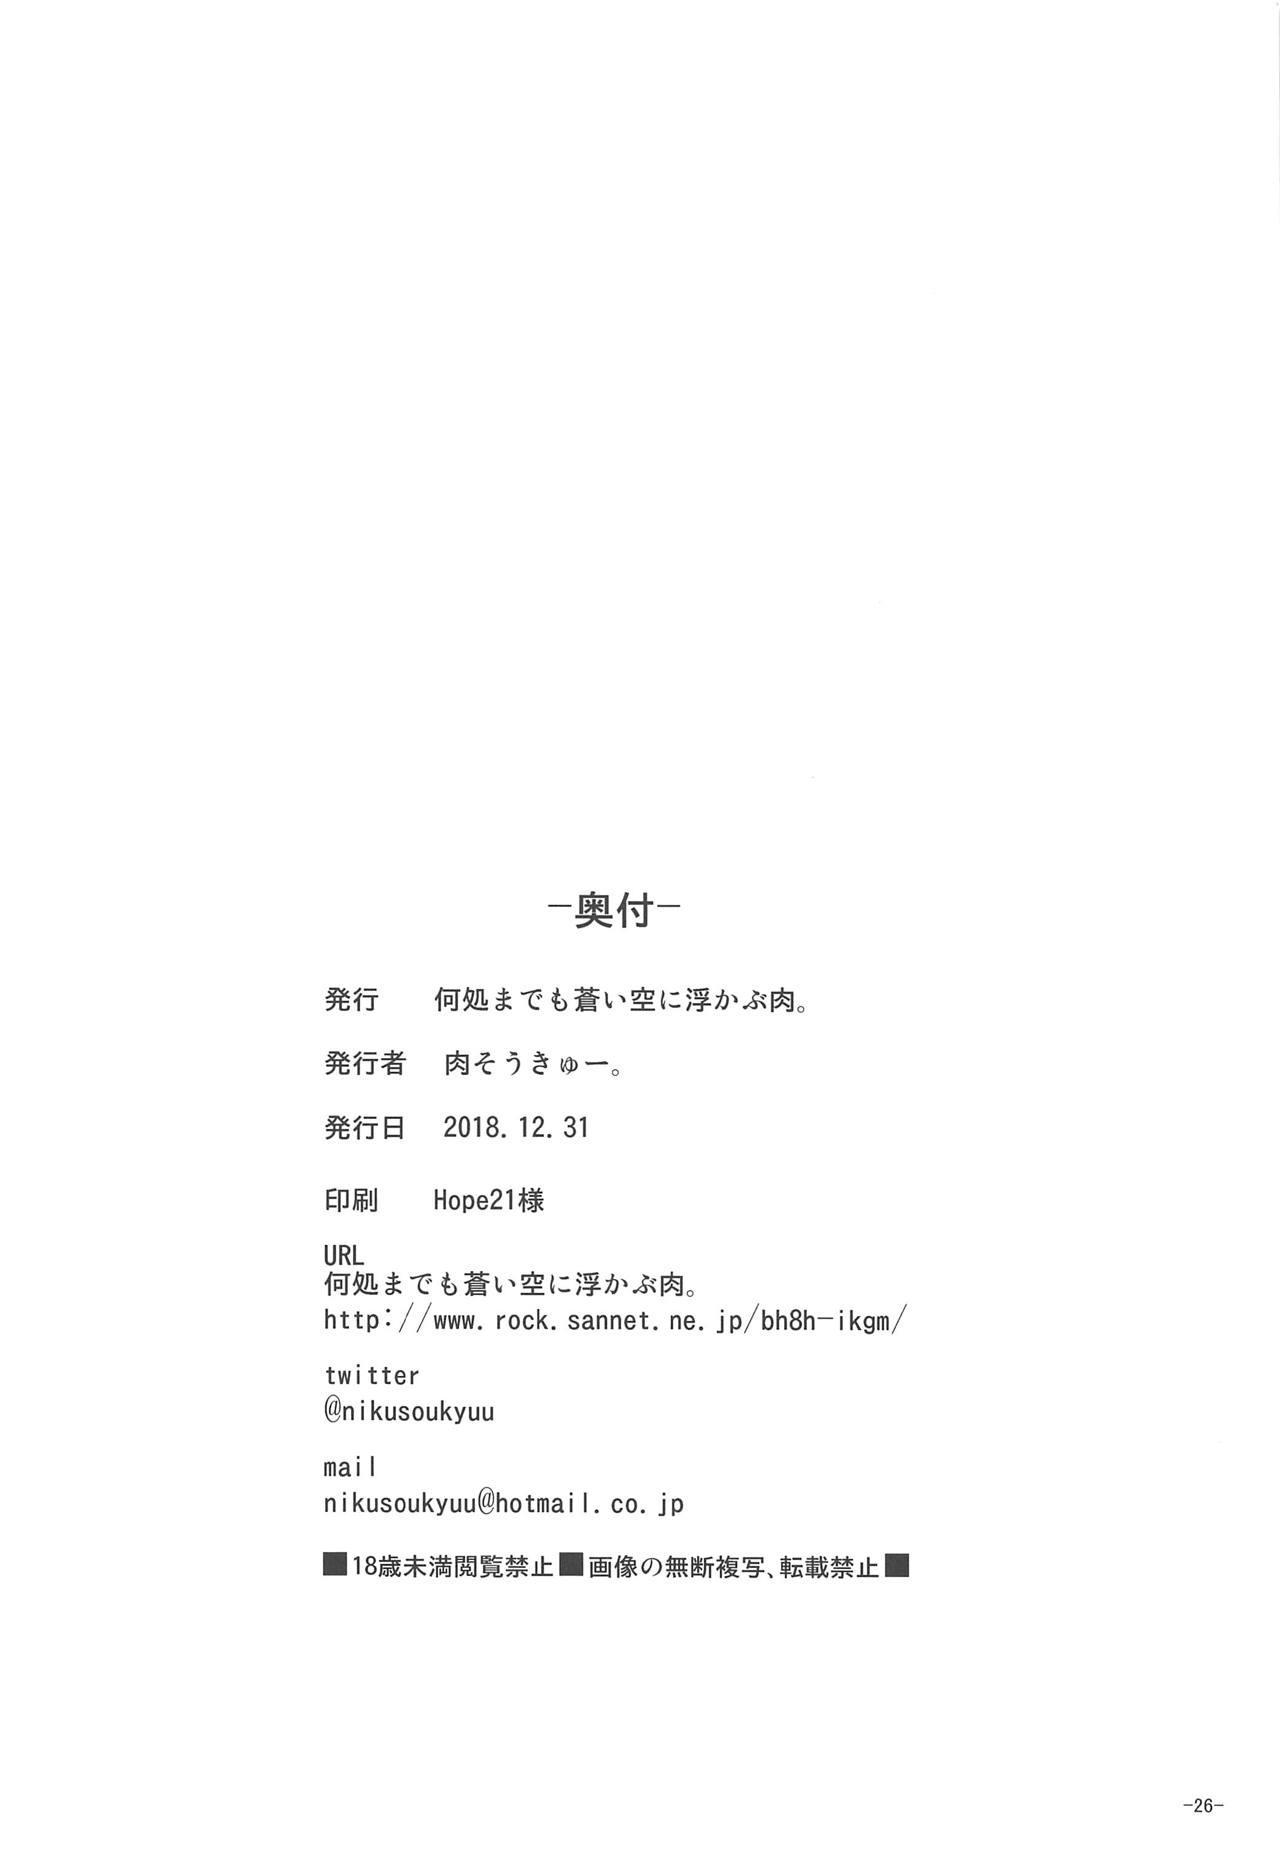 (C95) [Dokomademo Aoi Sora ni Ukabu Niku. (Nikusoukyuu.)] 9a-91-chan wa Miraretai. (Girls' Frontline) [Chinese] [v.v.t.m汉化组] 25